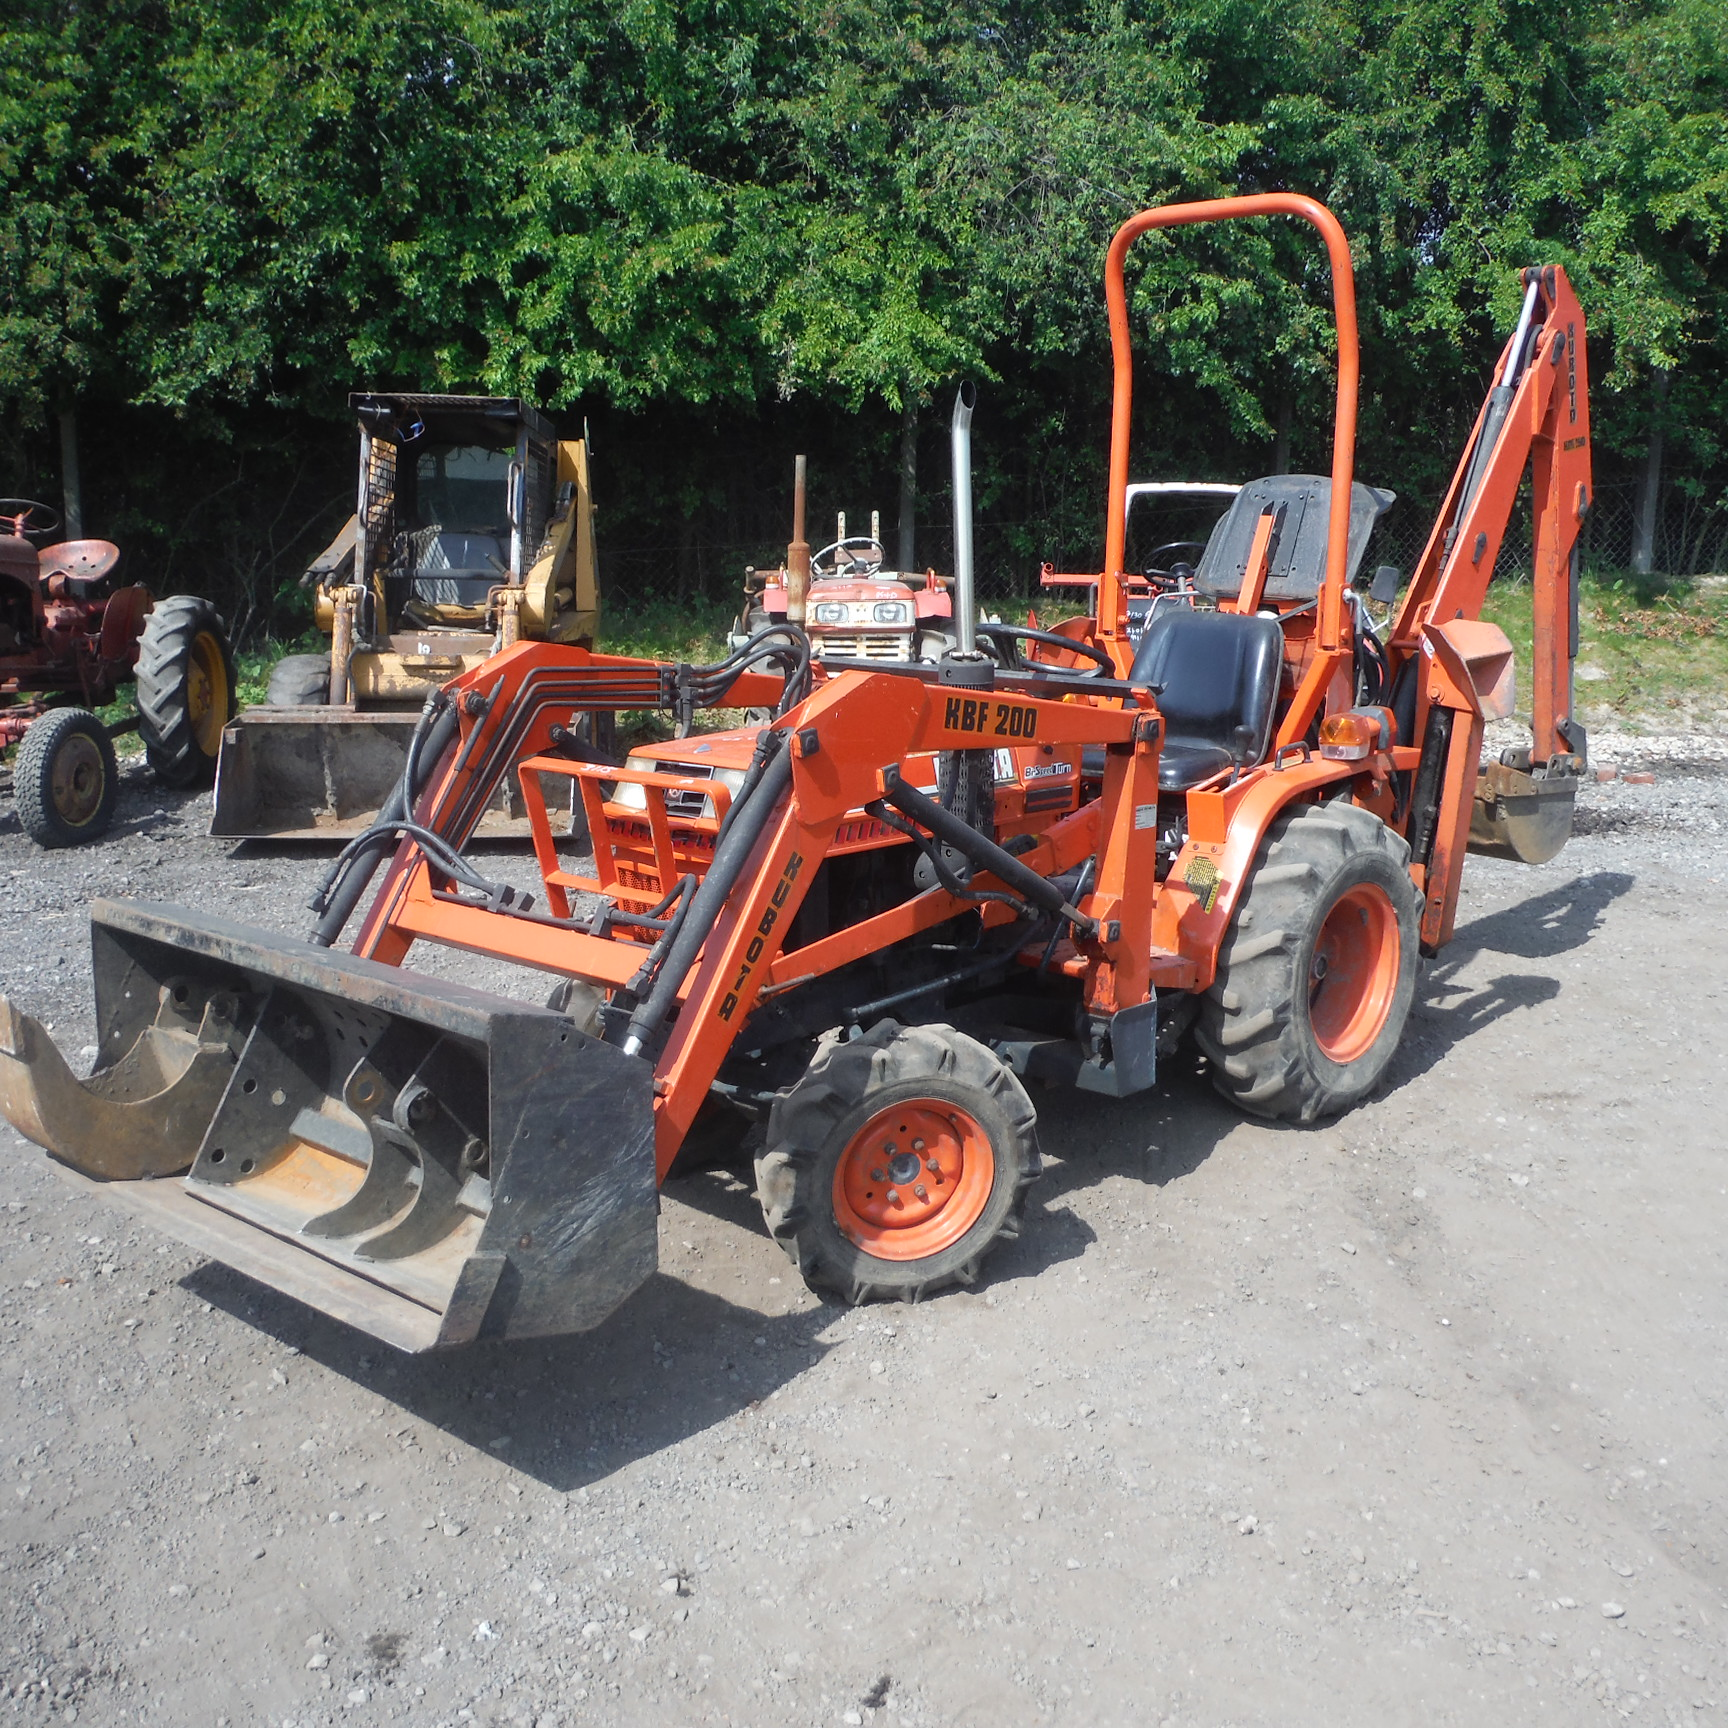 Kubota Backhoe Buckets : Kubota b wd compact tractor c w front loader backhoe